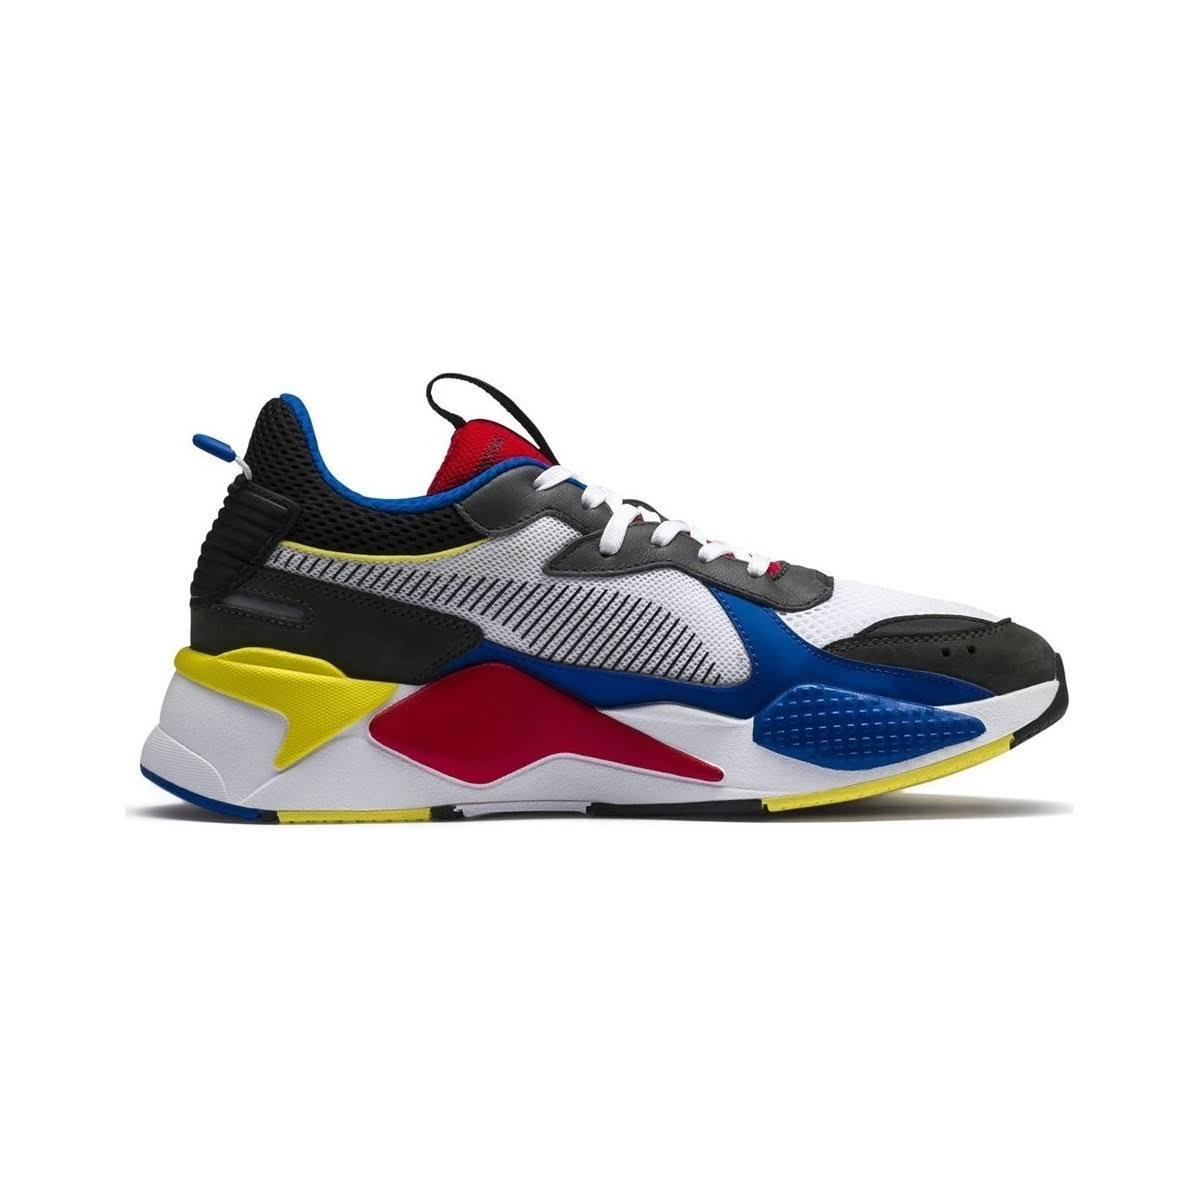 Puma LageherenGemengde Sneakers Toys Kleuren Rsx 8k0OnwPX